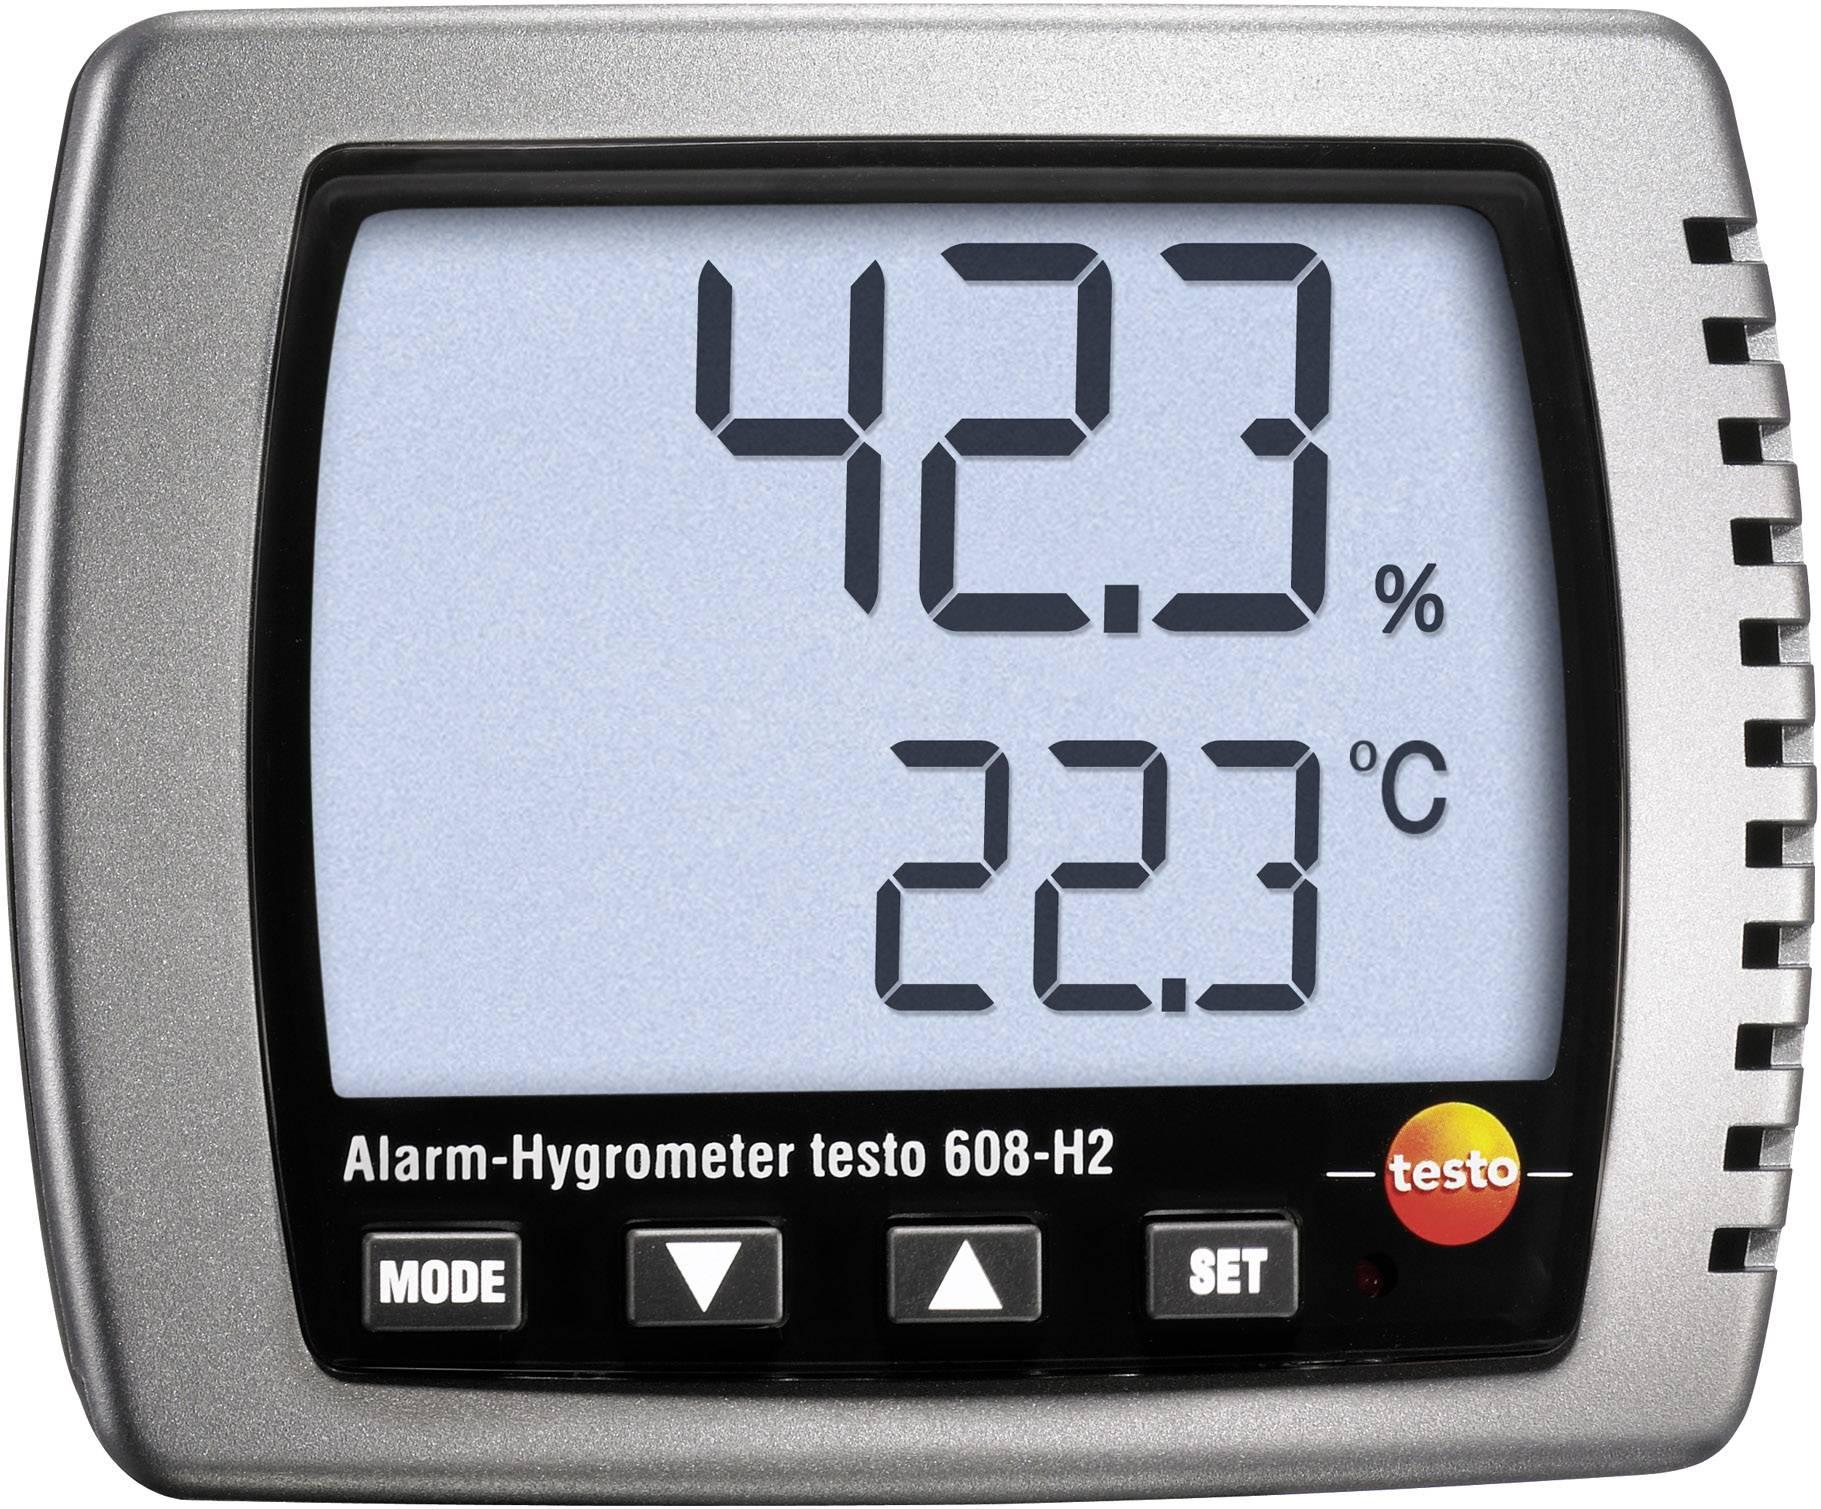 testo 608-H2 Igrometro 2 % ur